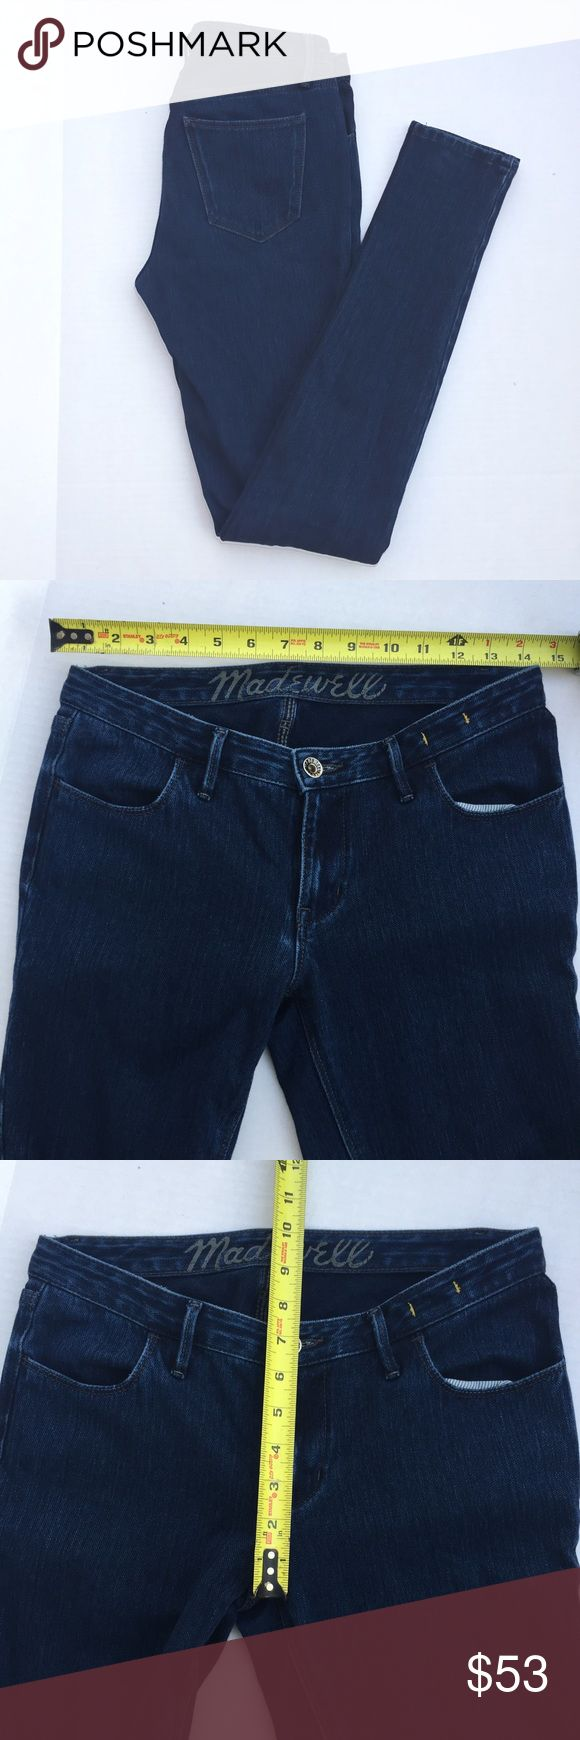 Madewell Skinny Jeans Madewell Skinny Jeans - GUC Madewell Jeans Skinny